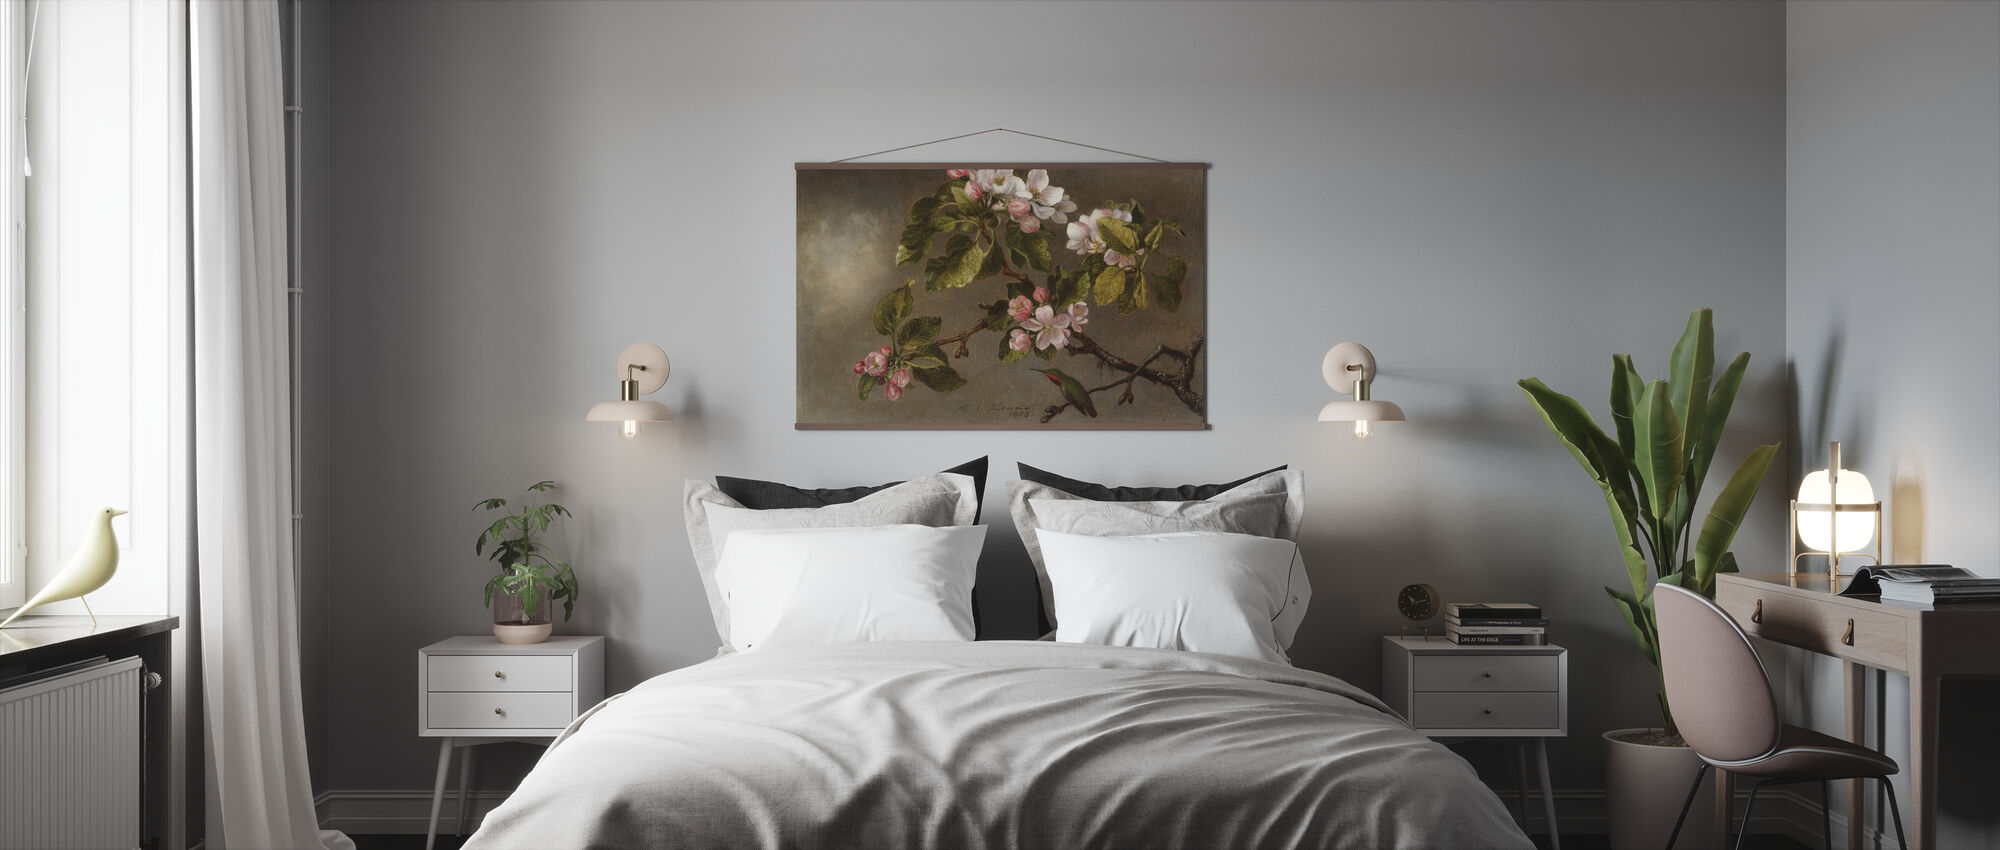 Kolibri ja Apple Blossoms - Martin Johnson Heade - Juliste - Makuuhuone